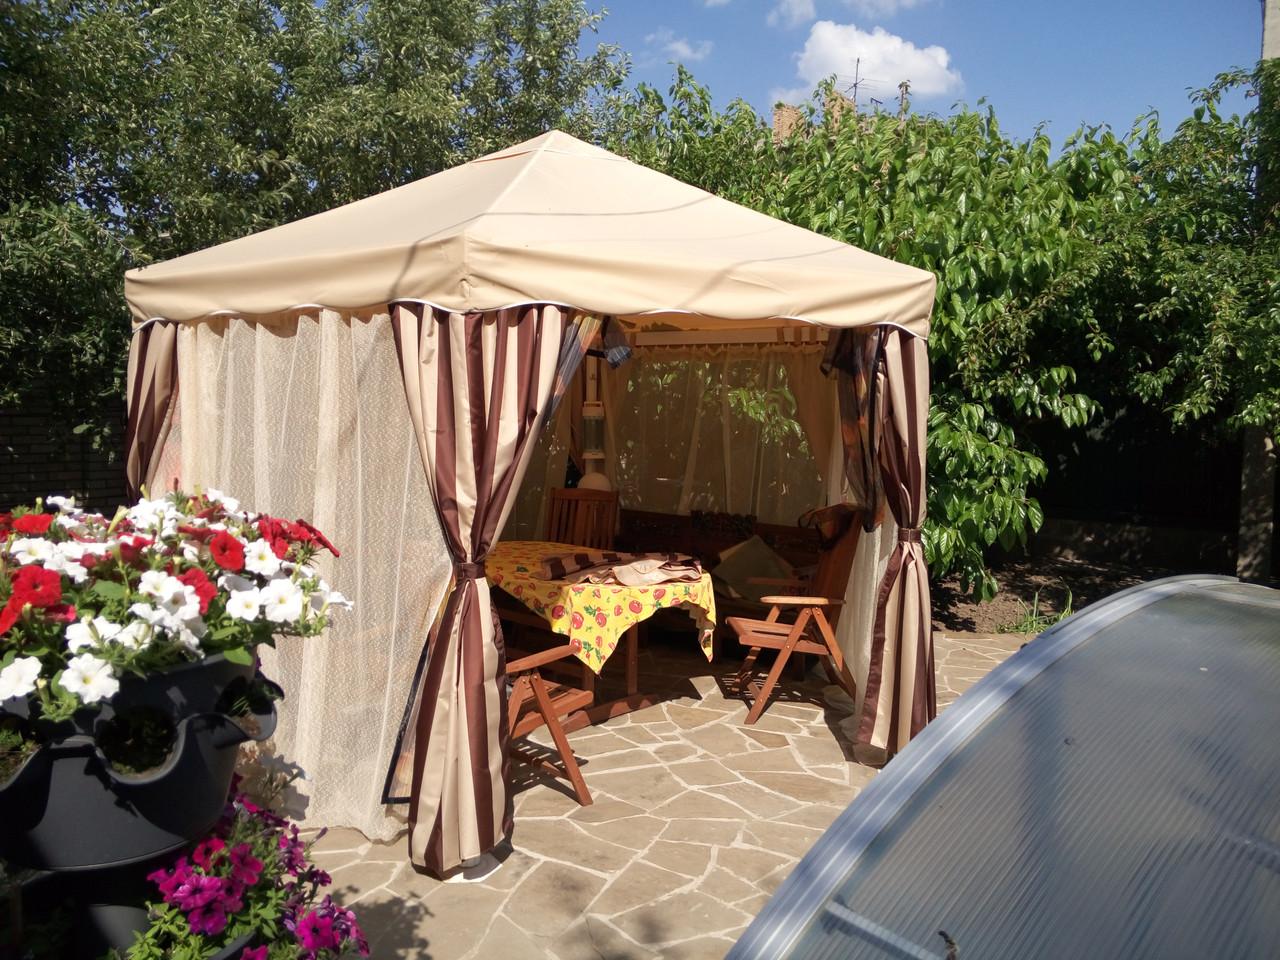 Тент для беседки (палатки) бежевый  3х3  под заказ за 1 день.